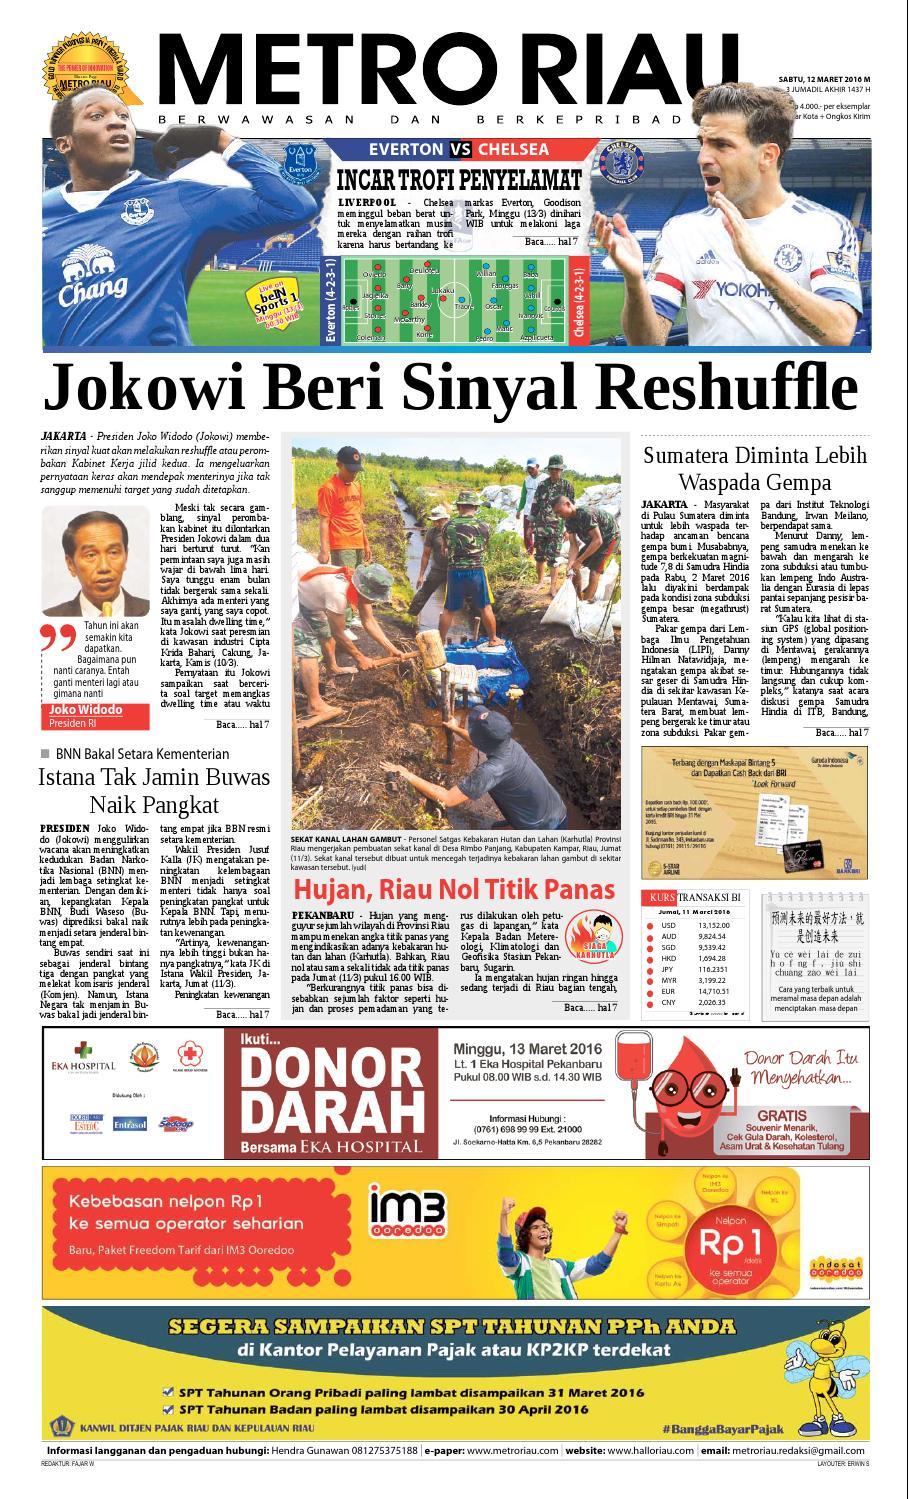 12032016 By Harian Pagi Metro Riau Issuu Produk Ukm Bumn Tekiro Tang Buaya 10